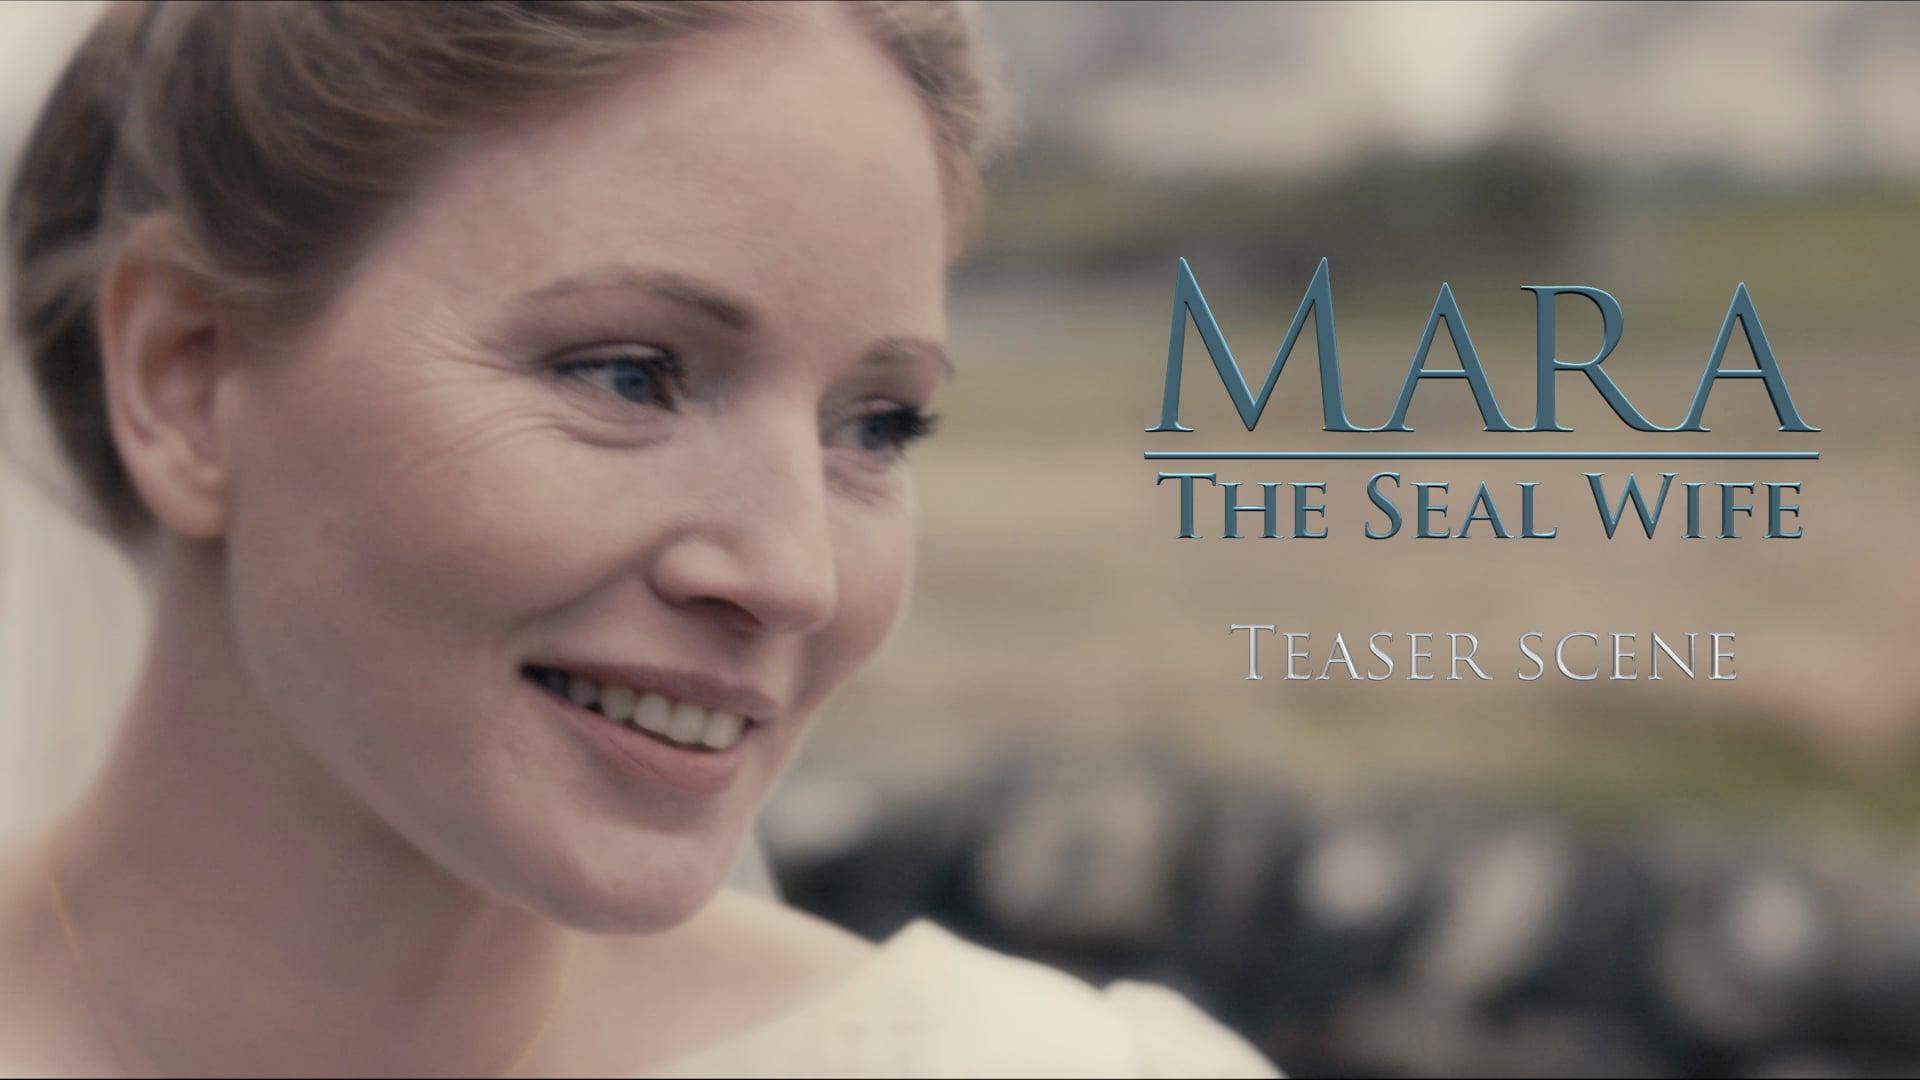 Teaser Scene - Mara: The Seal Wife